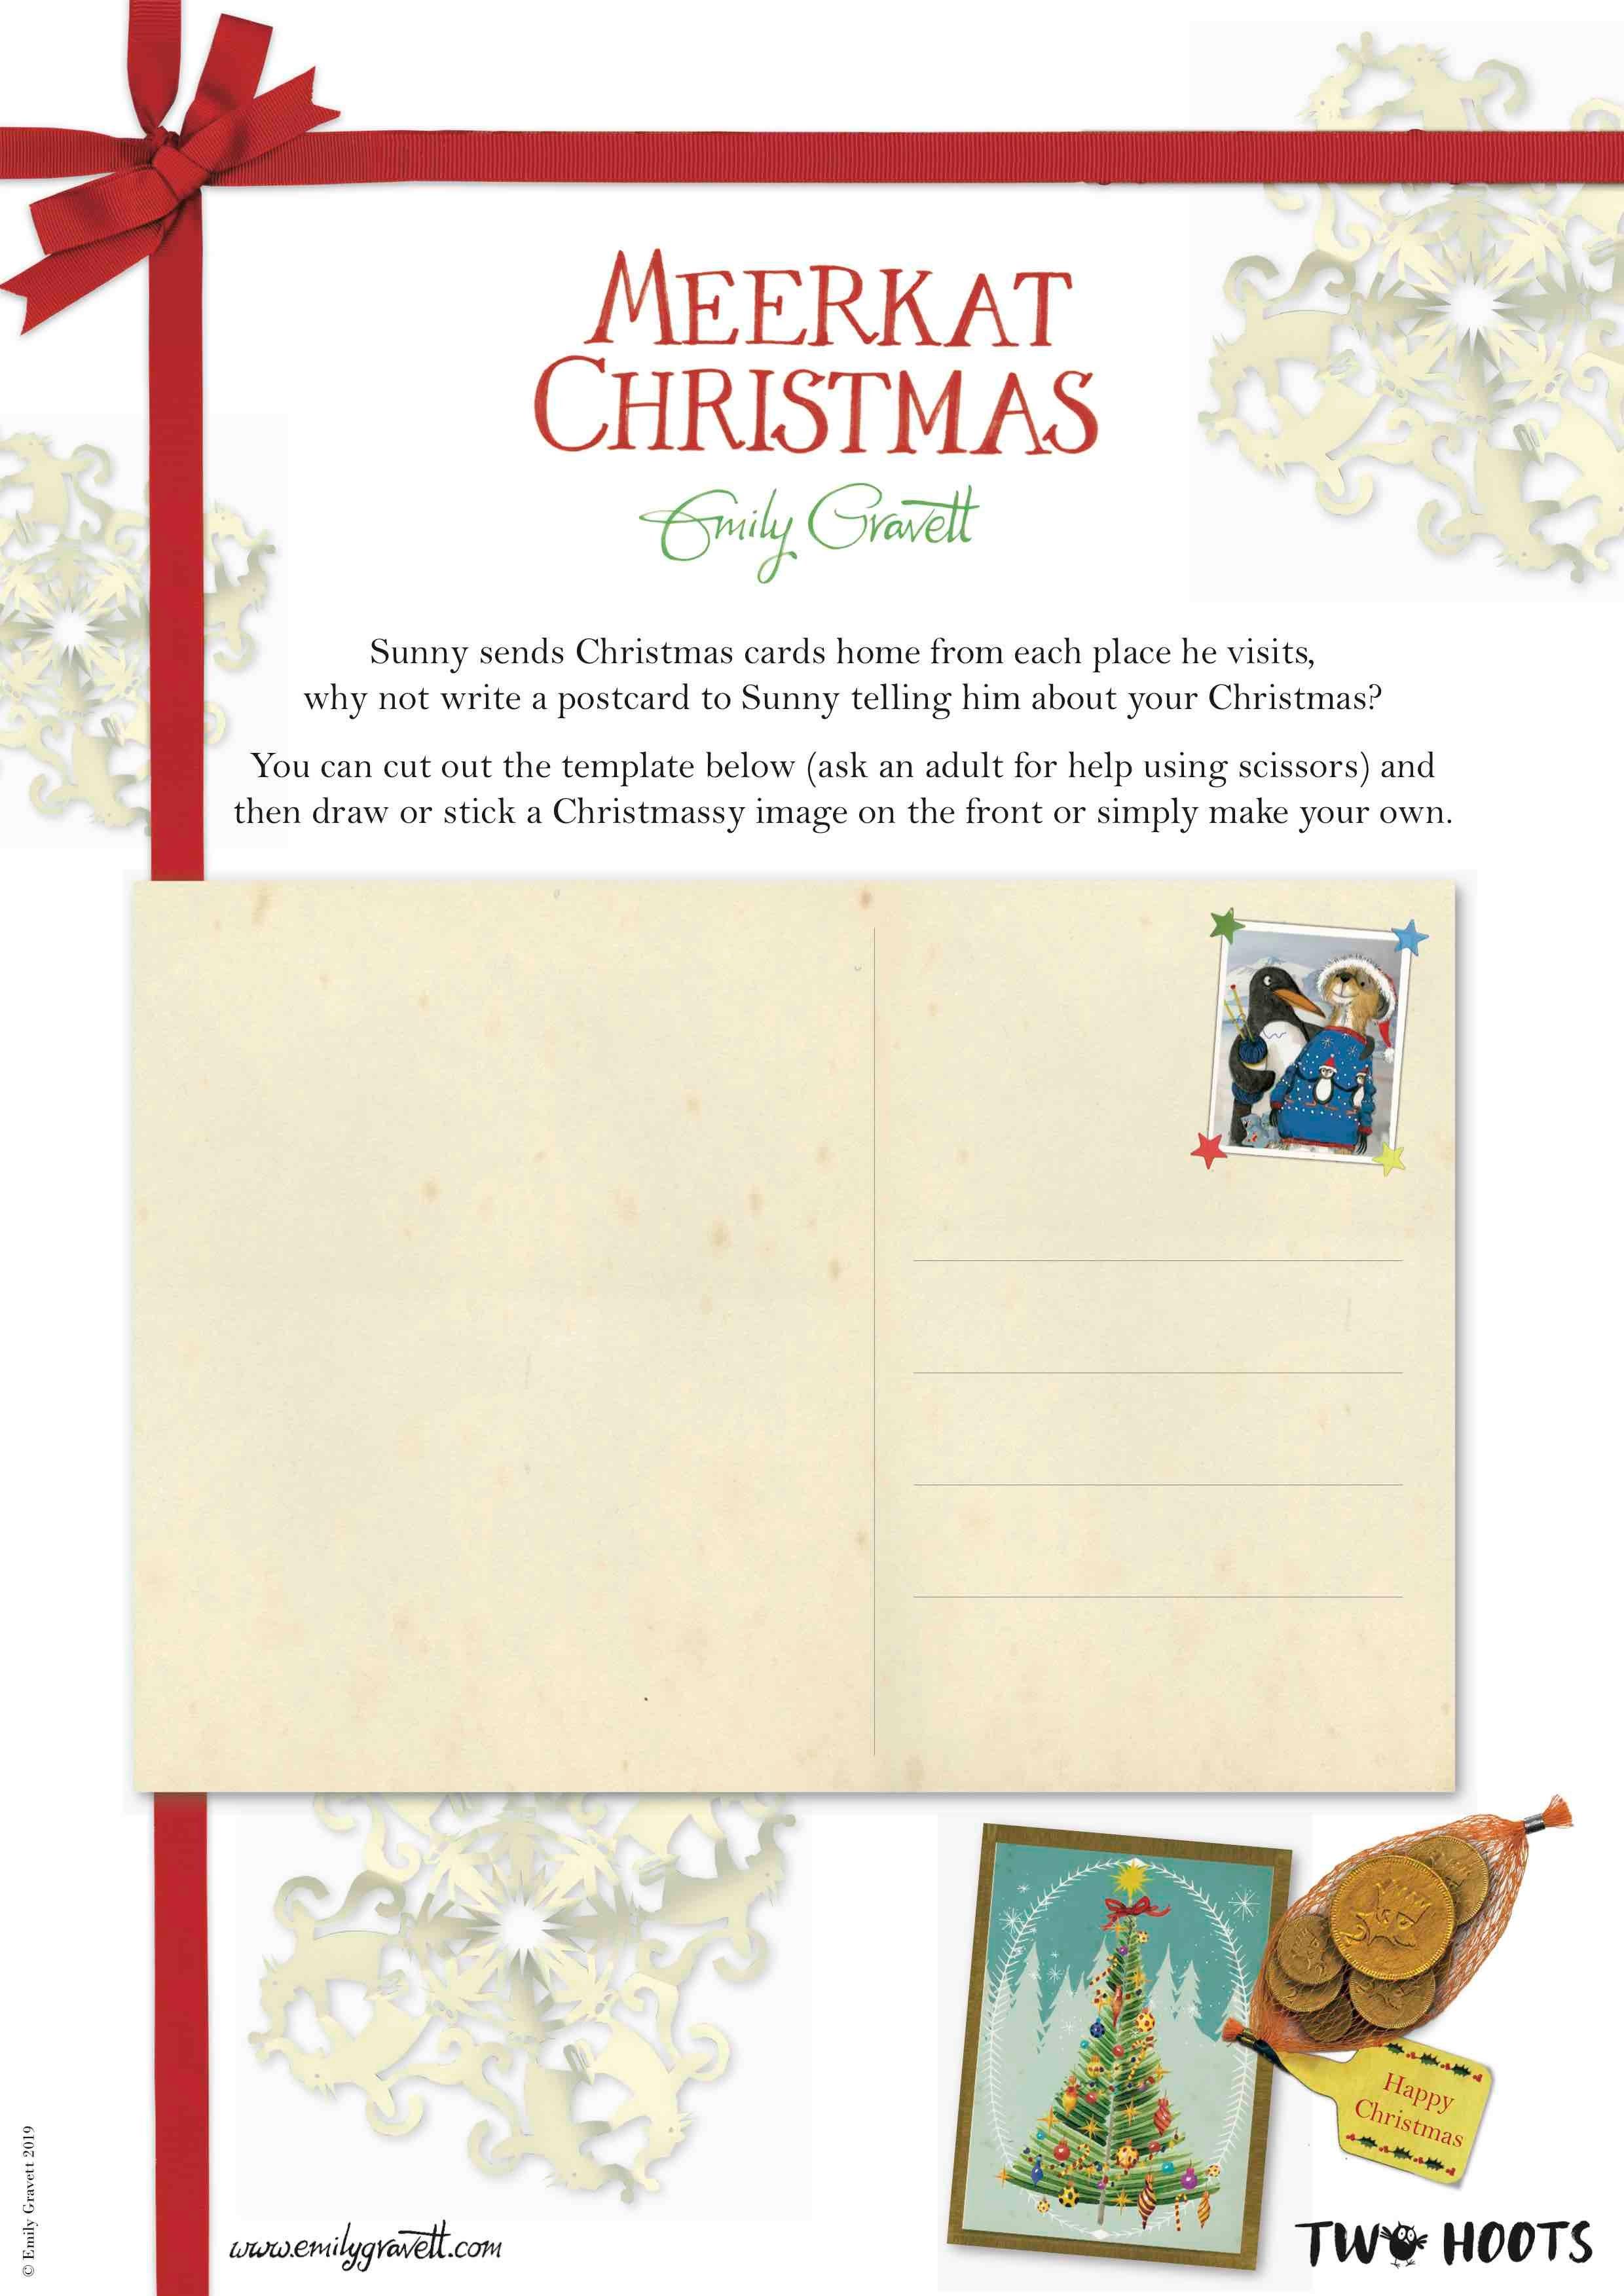 Meerkat-Christmas-Postcard-Activity-web-image.jpg